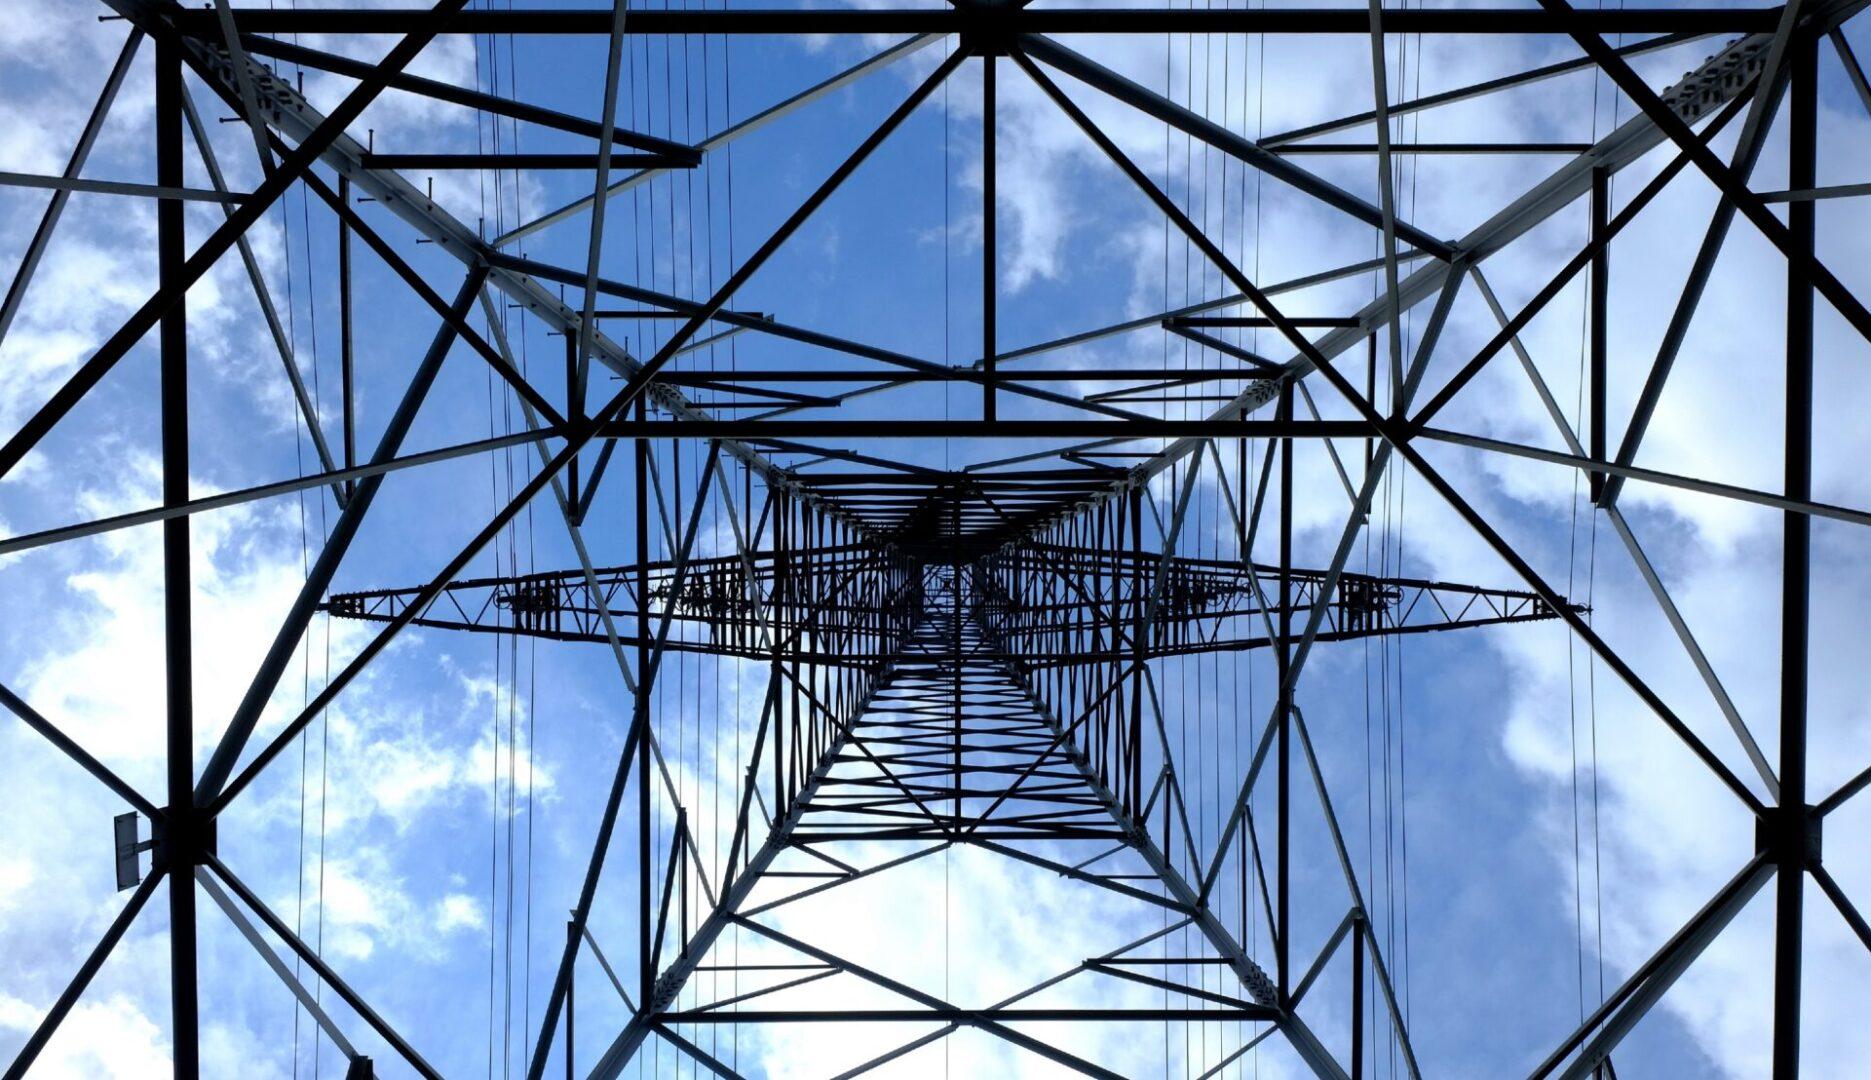 Symbolbild Enerige: Strommast